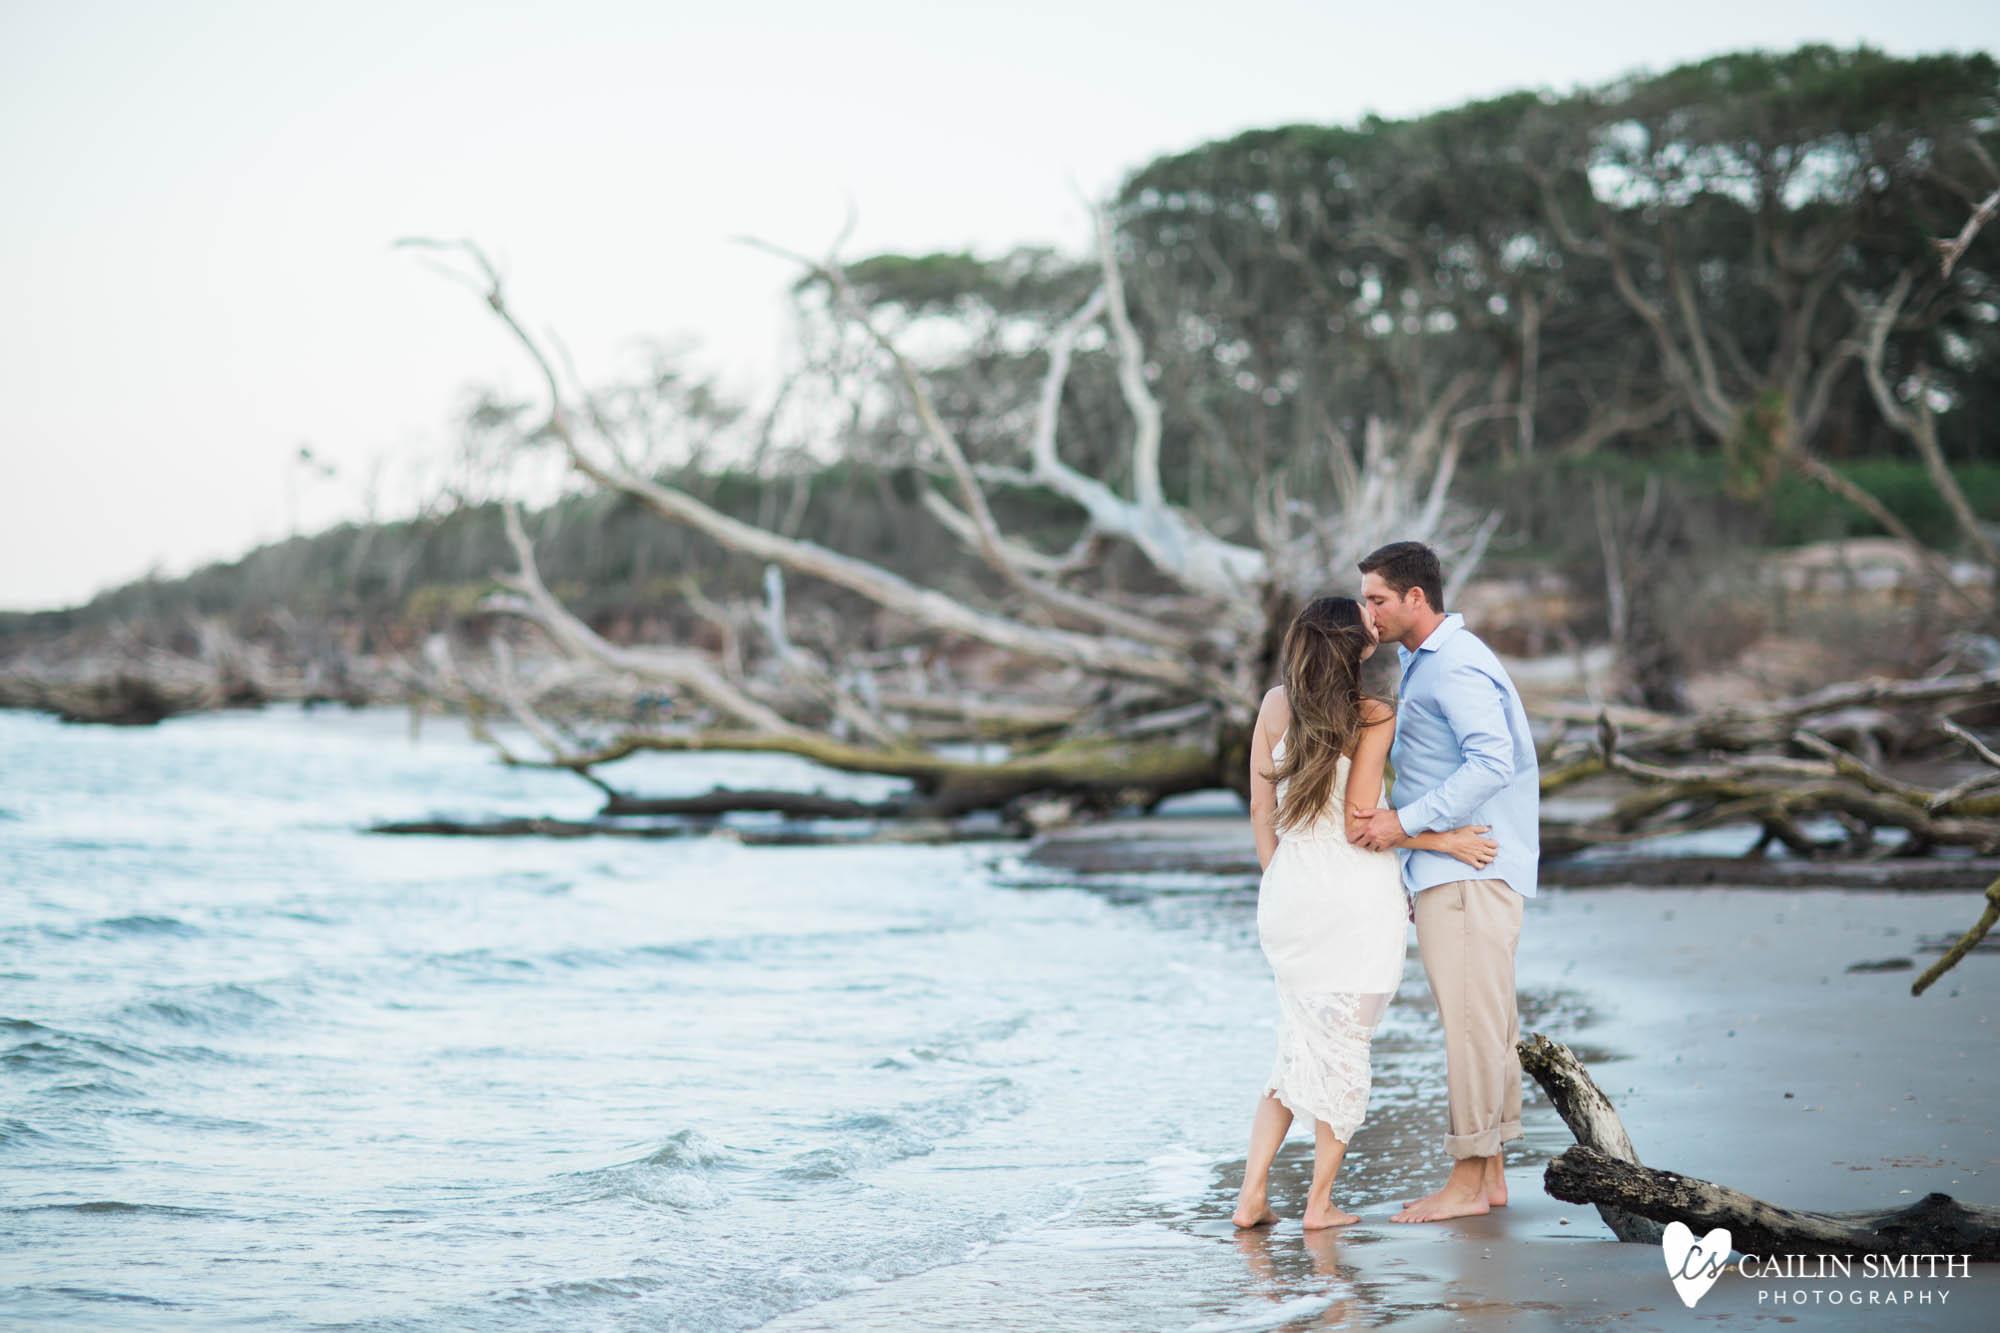 Megan_Tyson_Little_Talbot_Engagement_013.jpg